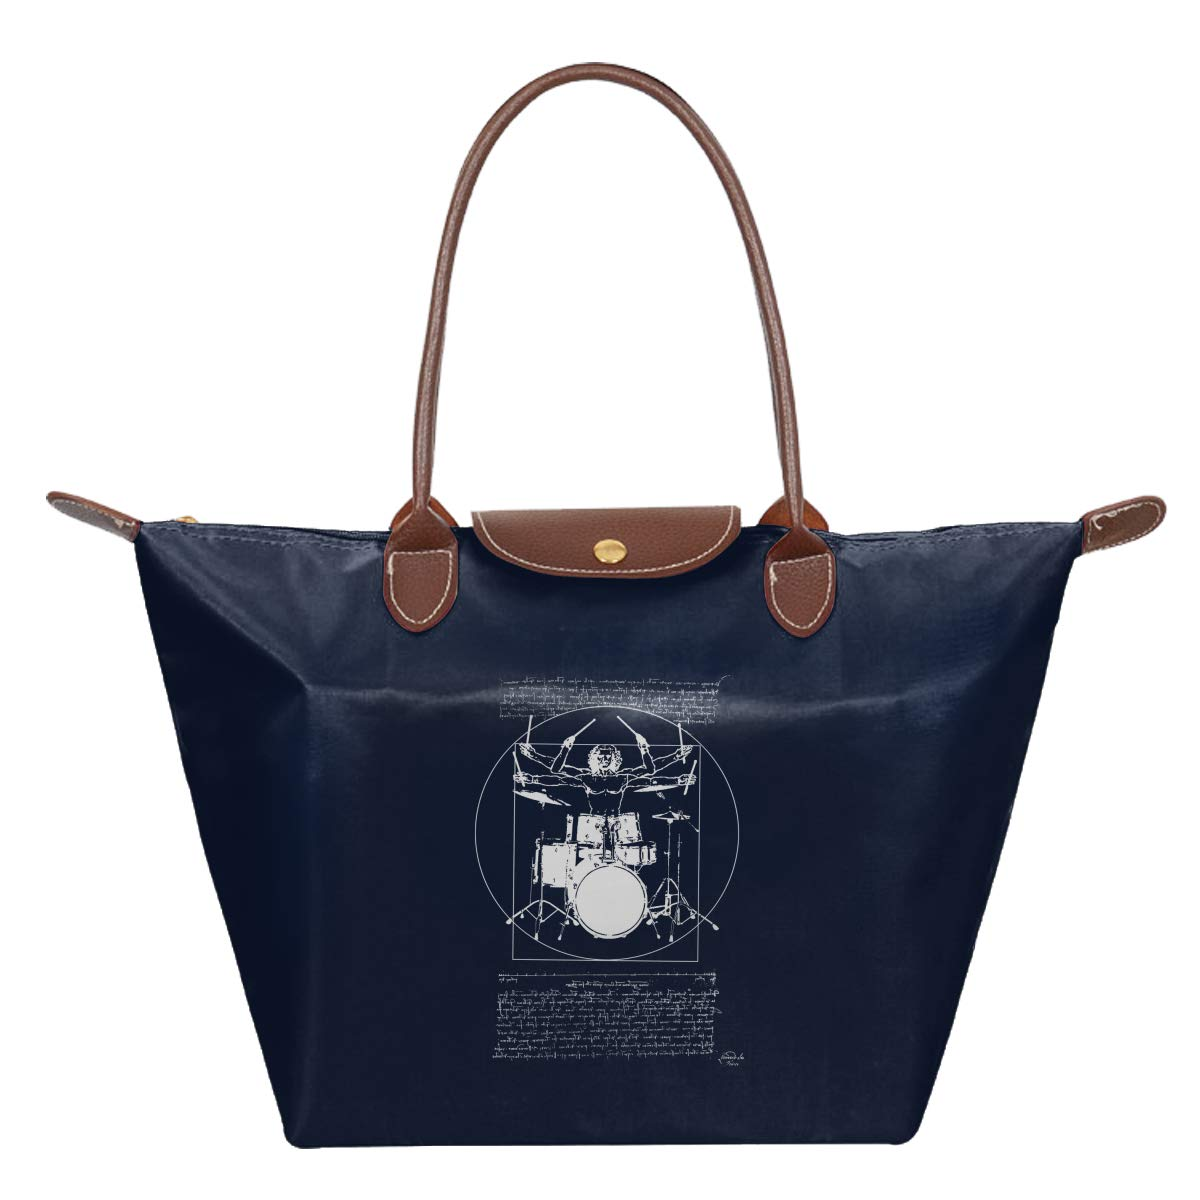 Leonardo Vit-ruvian Drummer Premium Drum Set Waterproof Leather Folded Messenger Nylon Bag Travel Tote Hopping Folding School Handbags